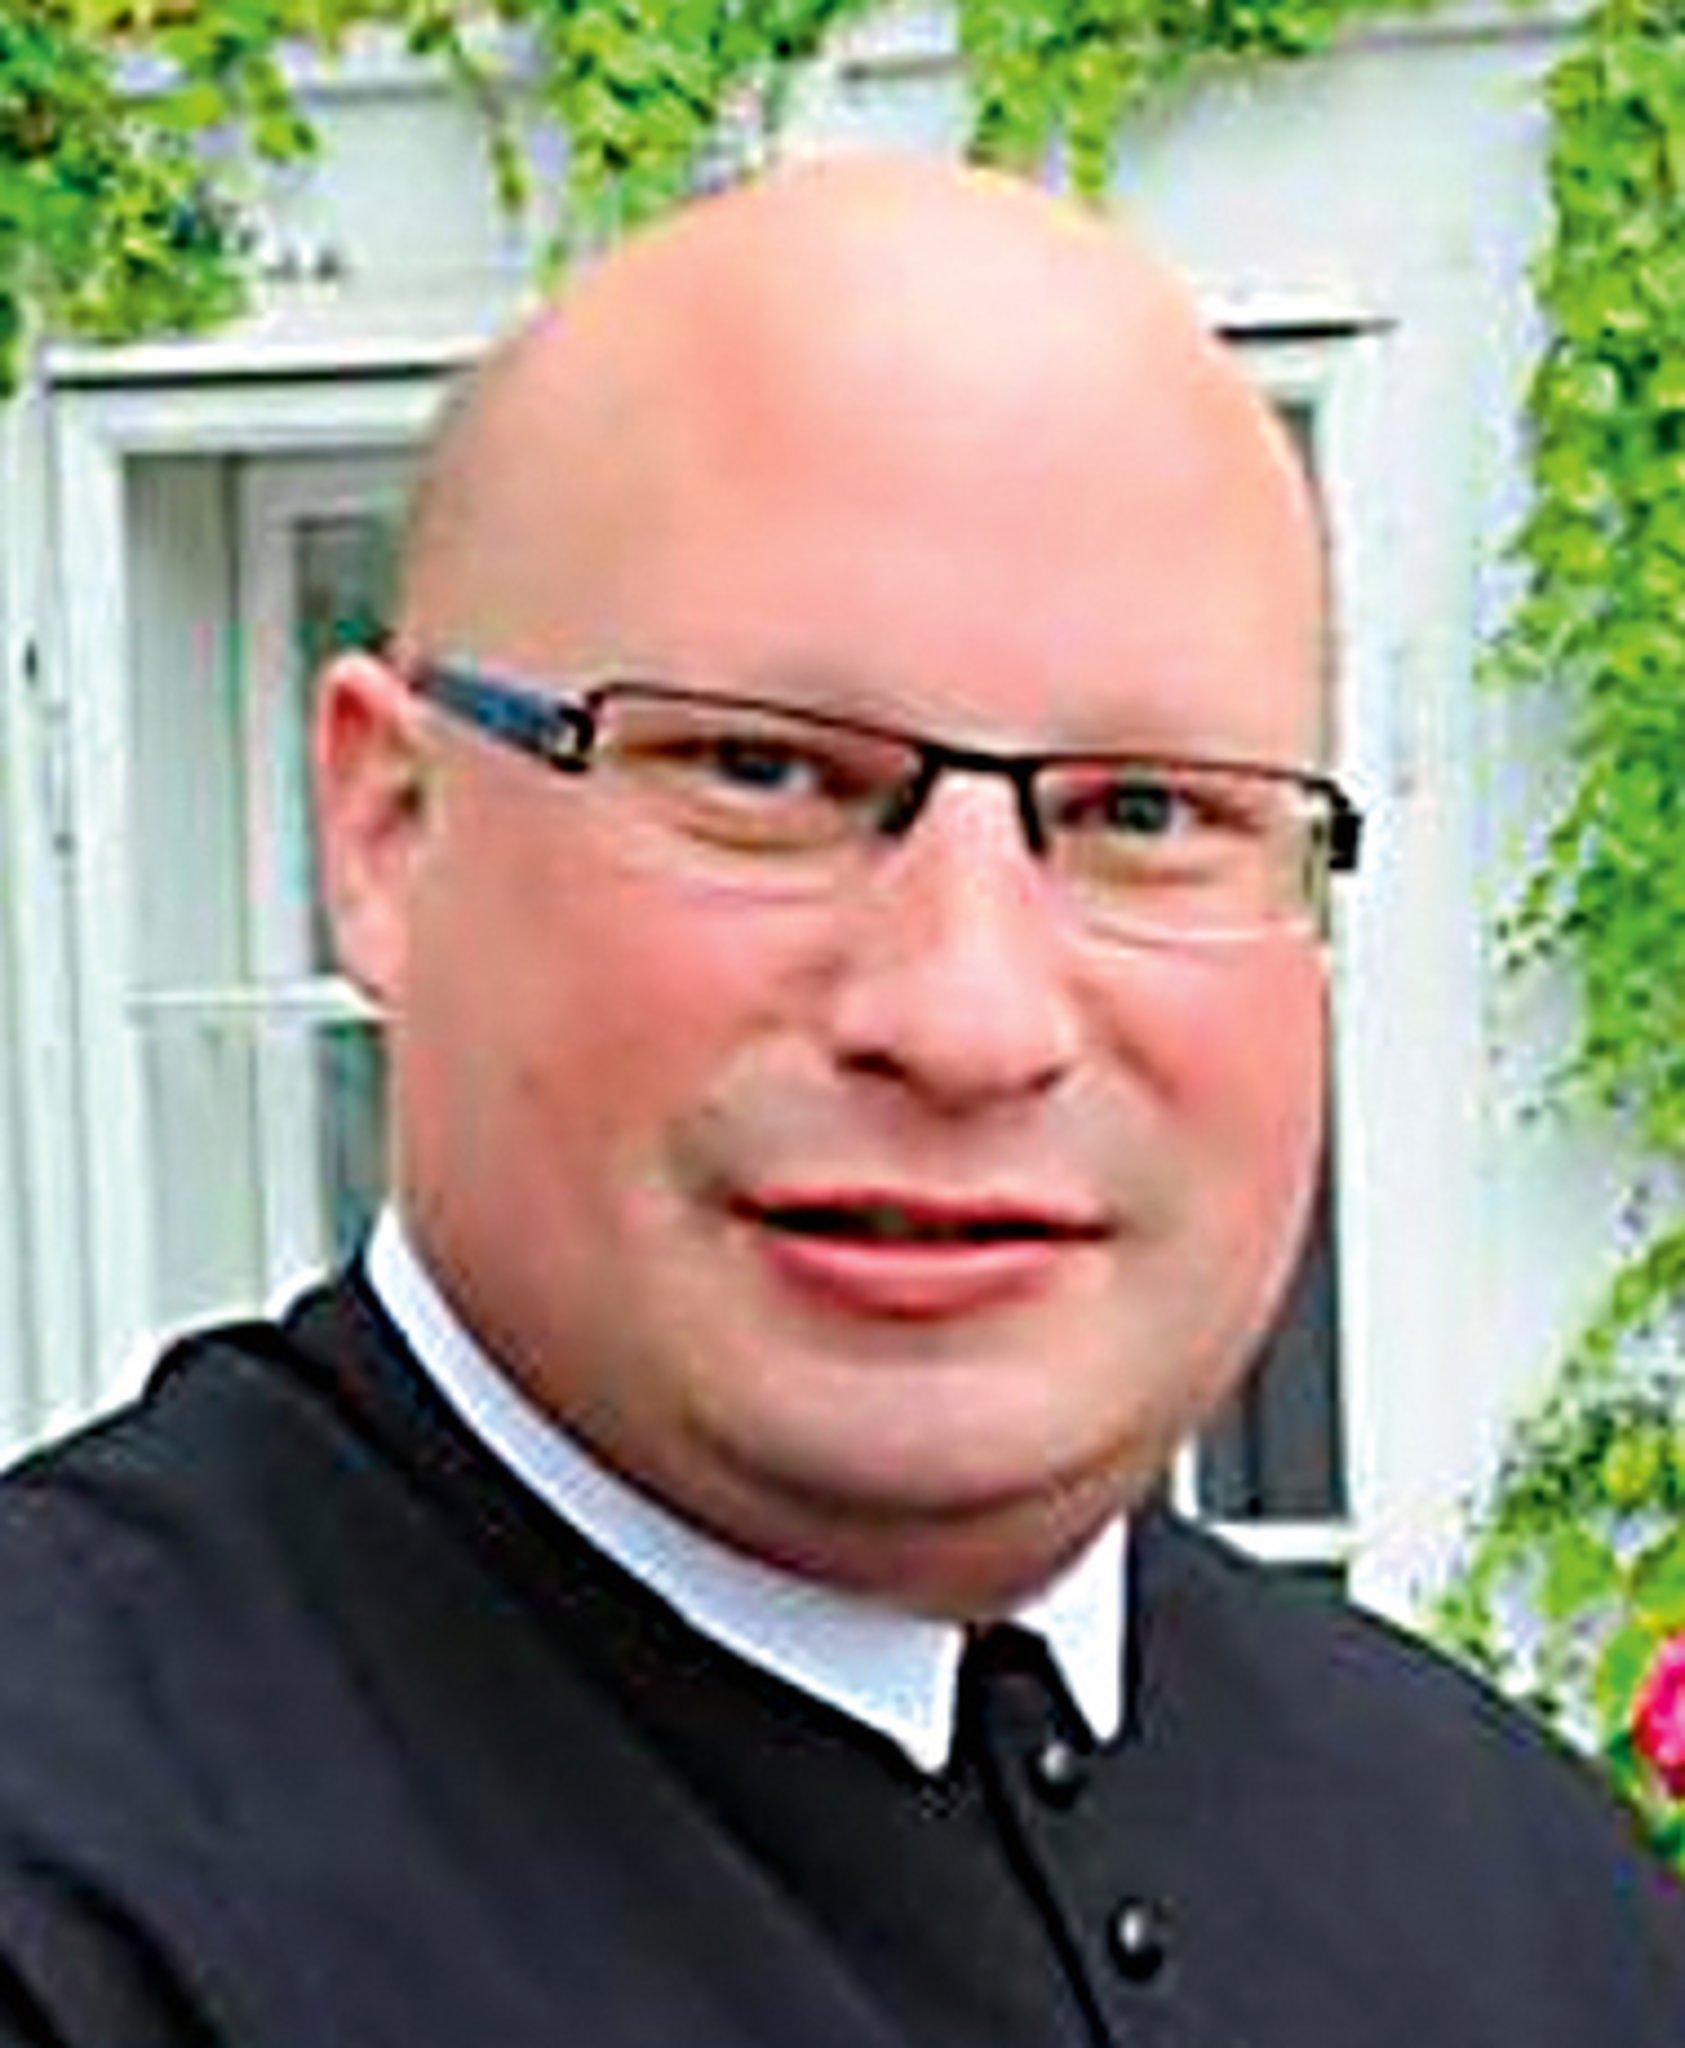 Pater Leonhard Obex